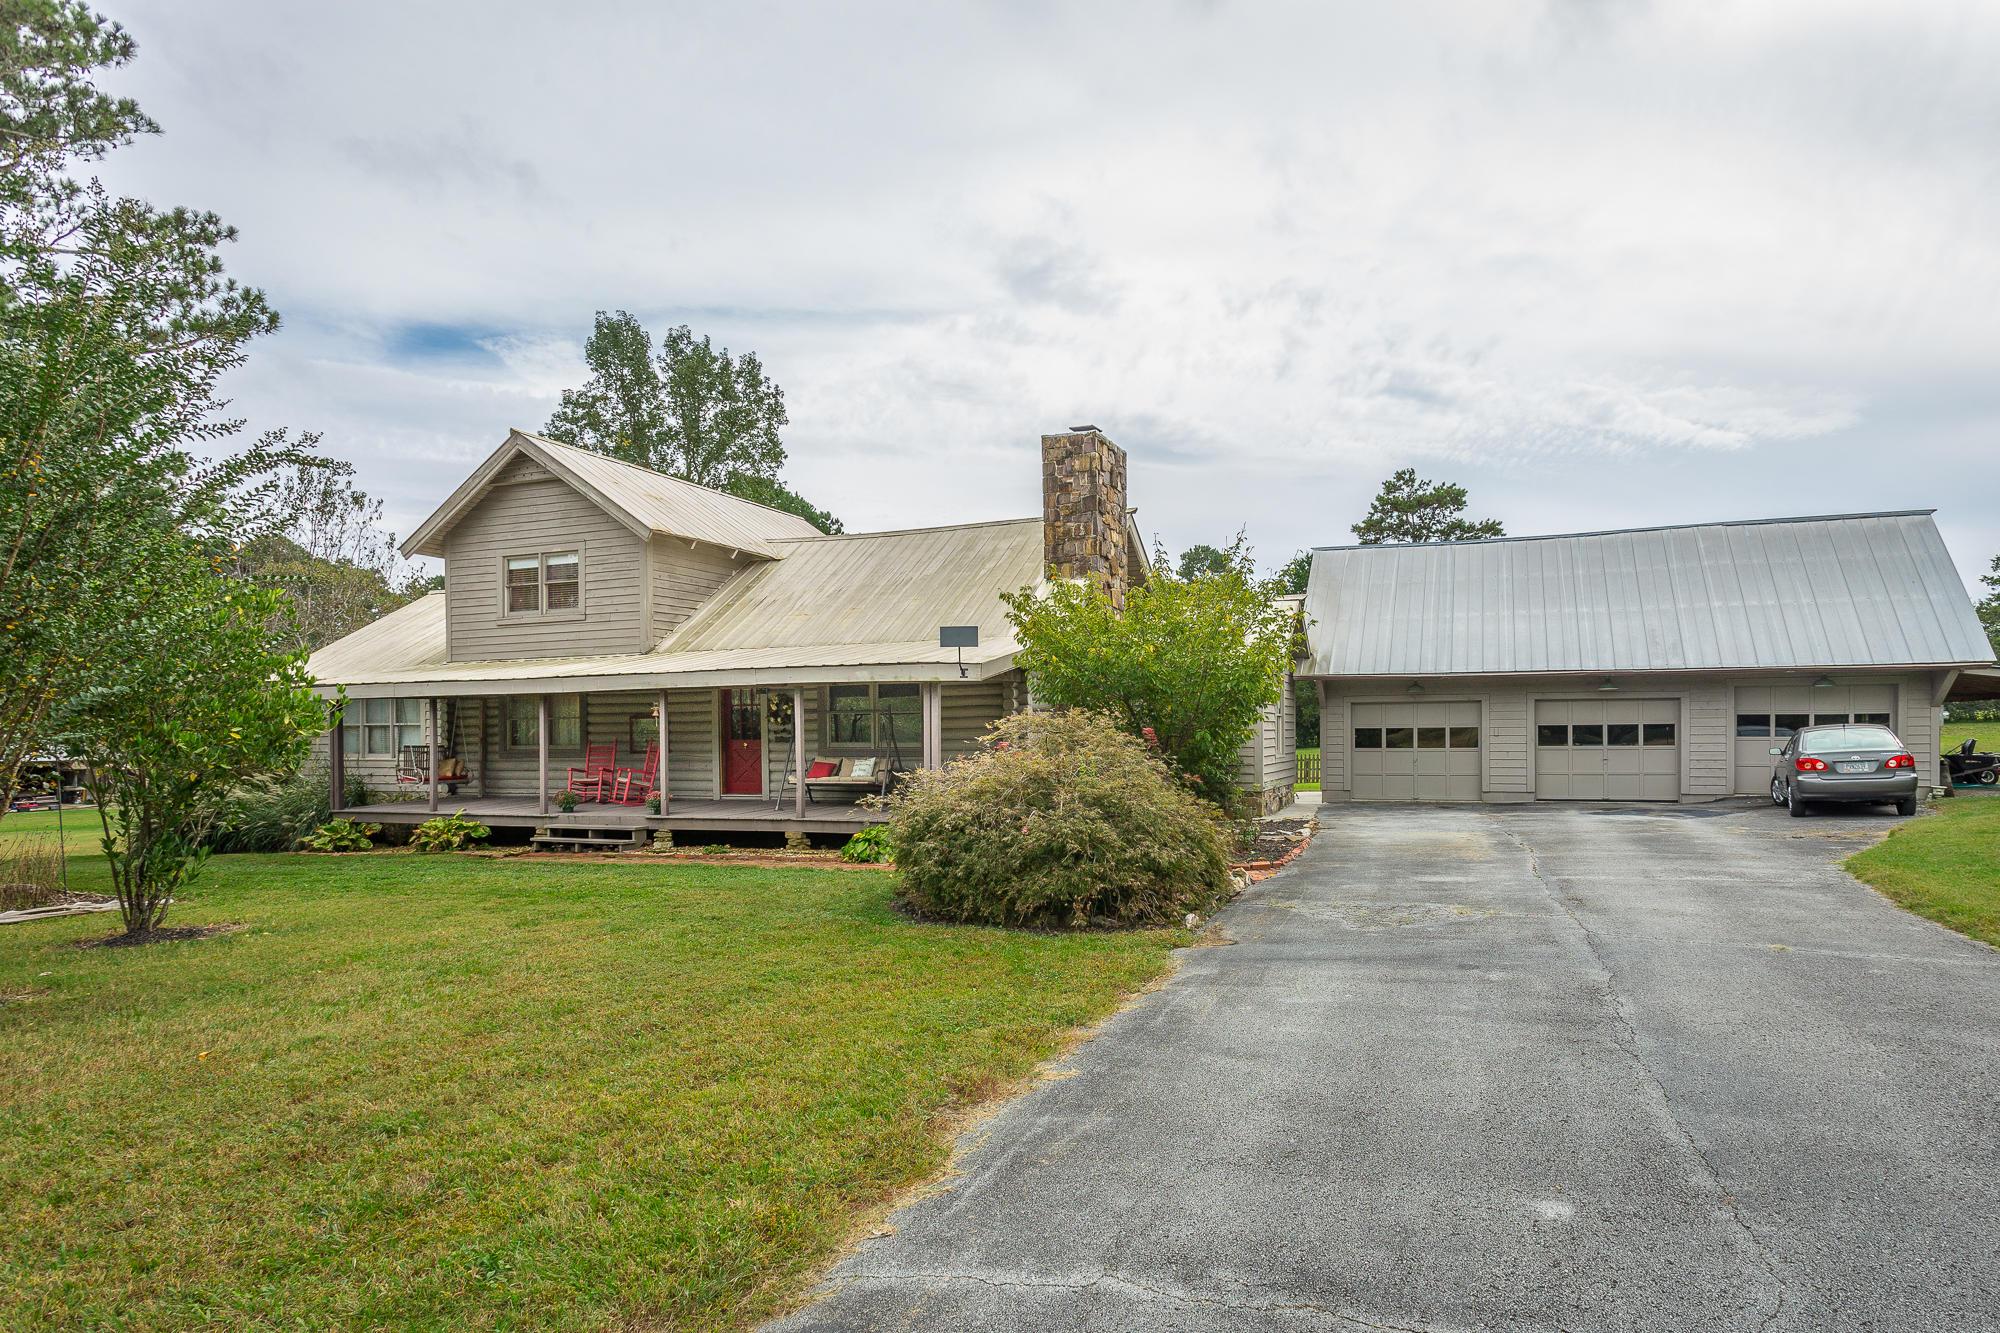 282 Earl Garner Rd, Ringgold, GA 30736